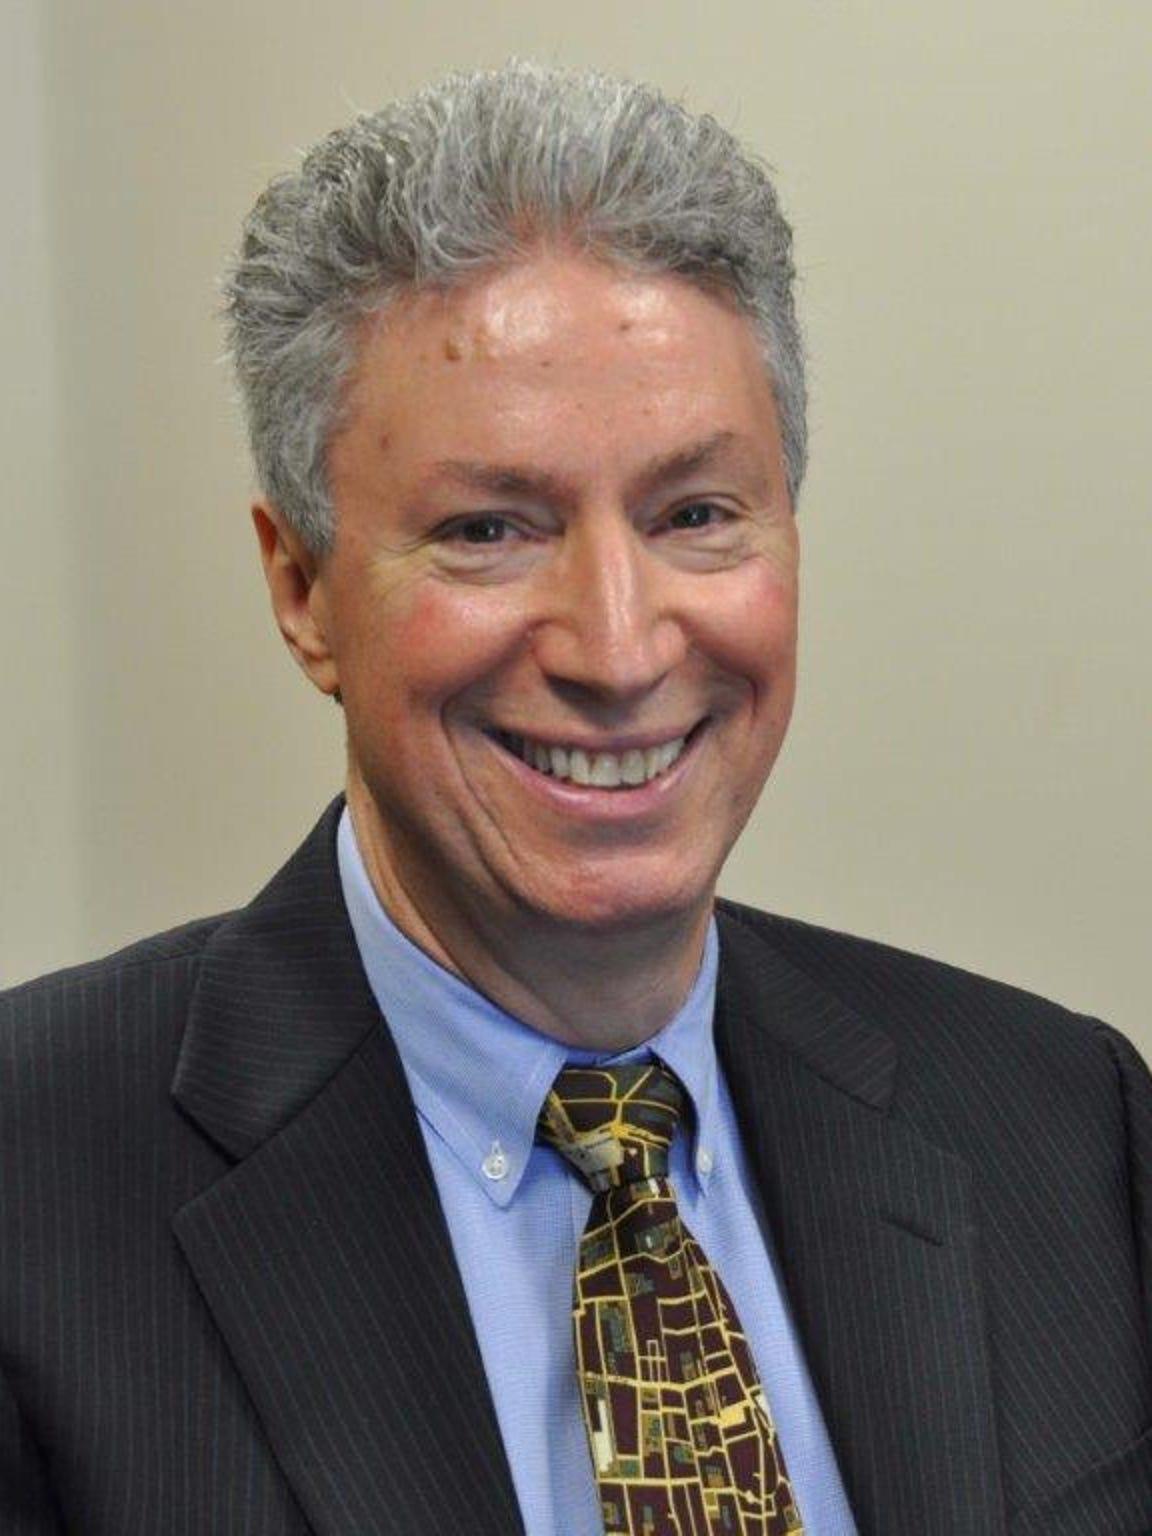 Paul Fried, former superintendent of Montville schools,